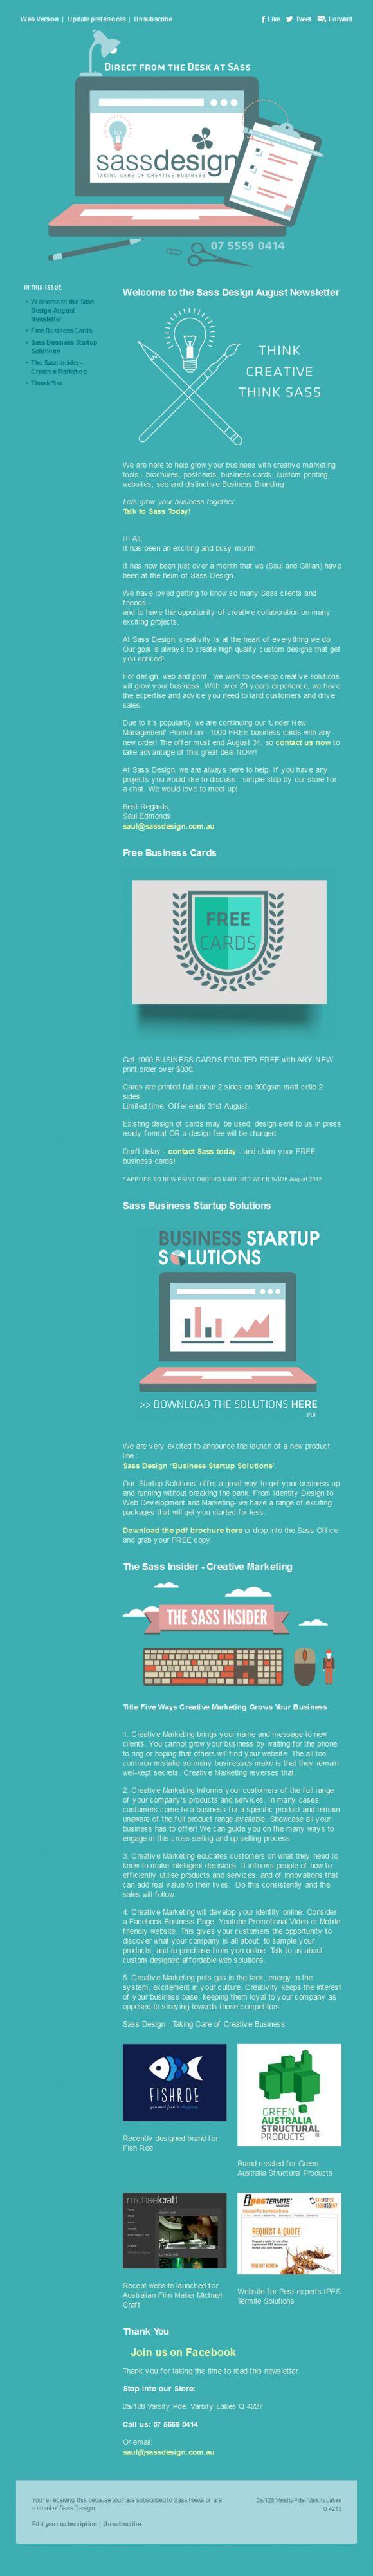 Sass design newsletter html email marketing design